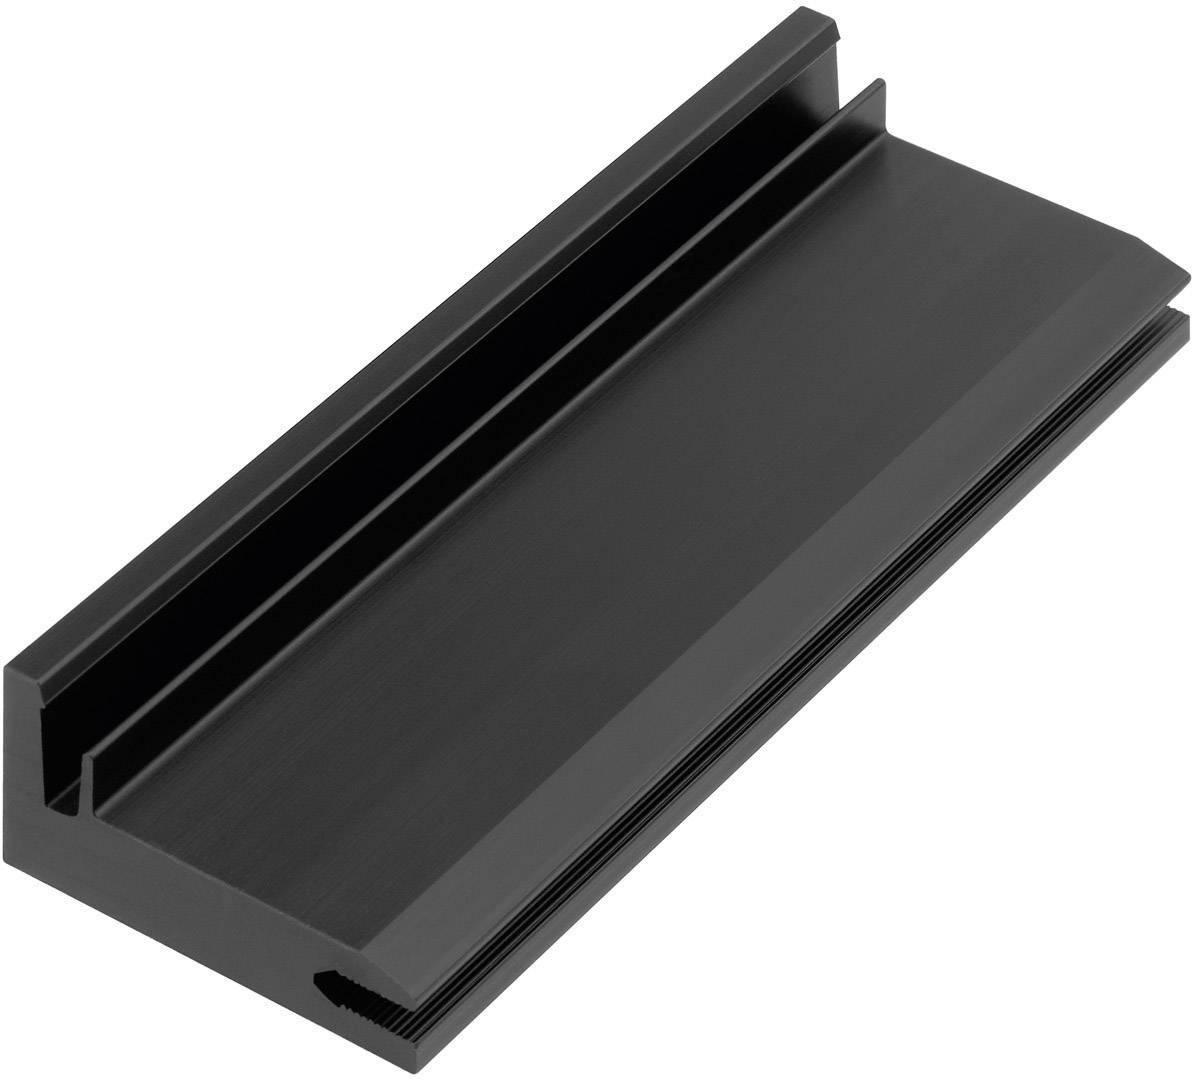 Clip chladič Aavid Thermalloy 0SY76/100/N, 2.5 K/W, (d x š x v) 100 x 17 x 37.28 mm